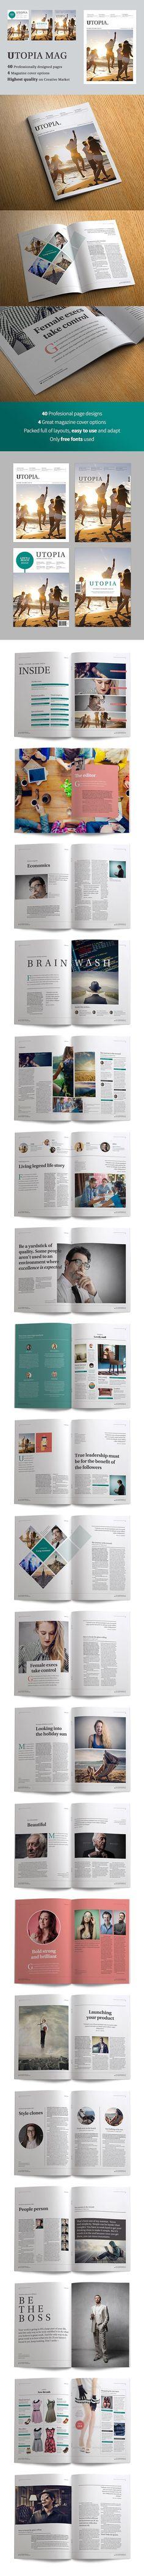 Utopia magazine - Magazines - 1